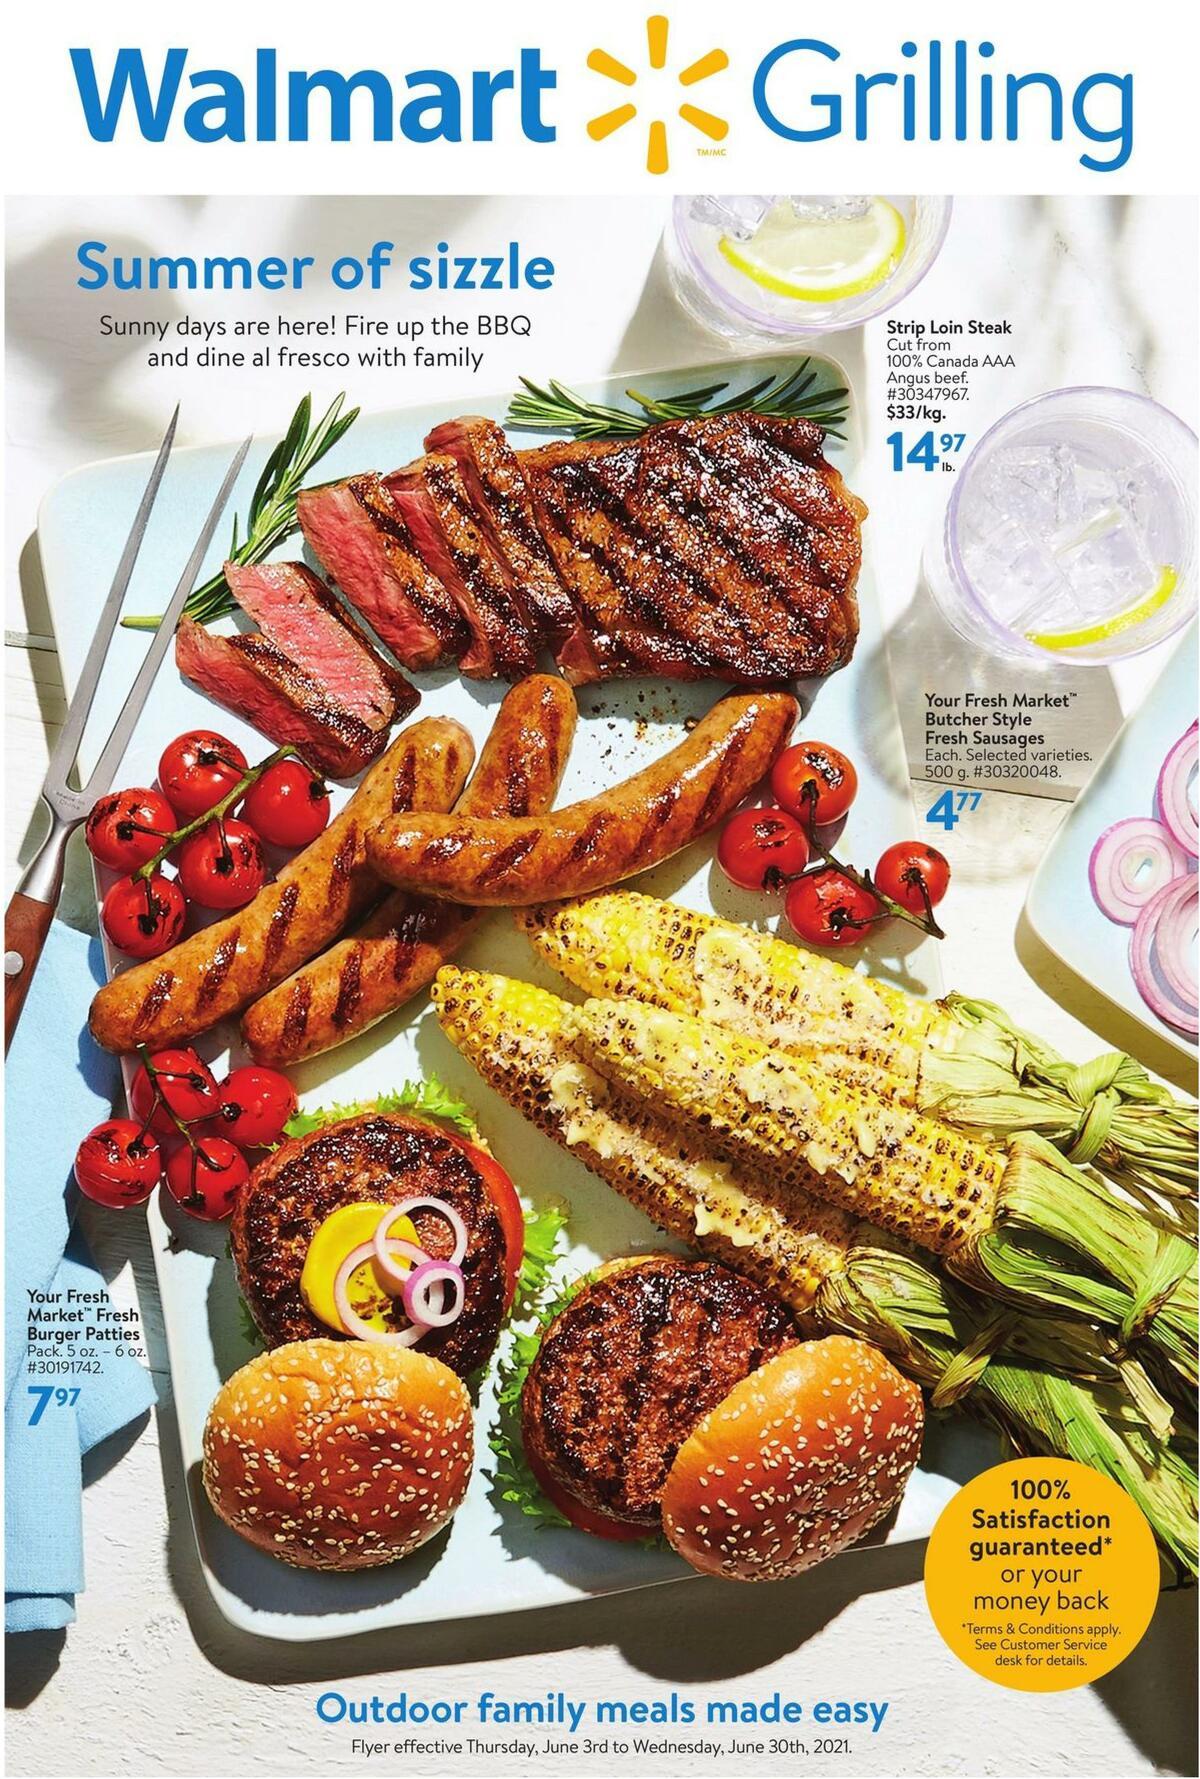 Walmart Grilling Flyer from June 3